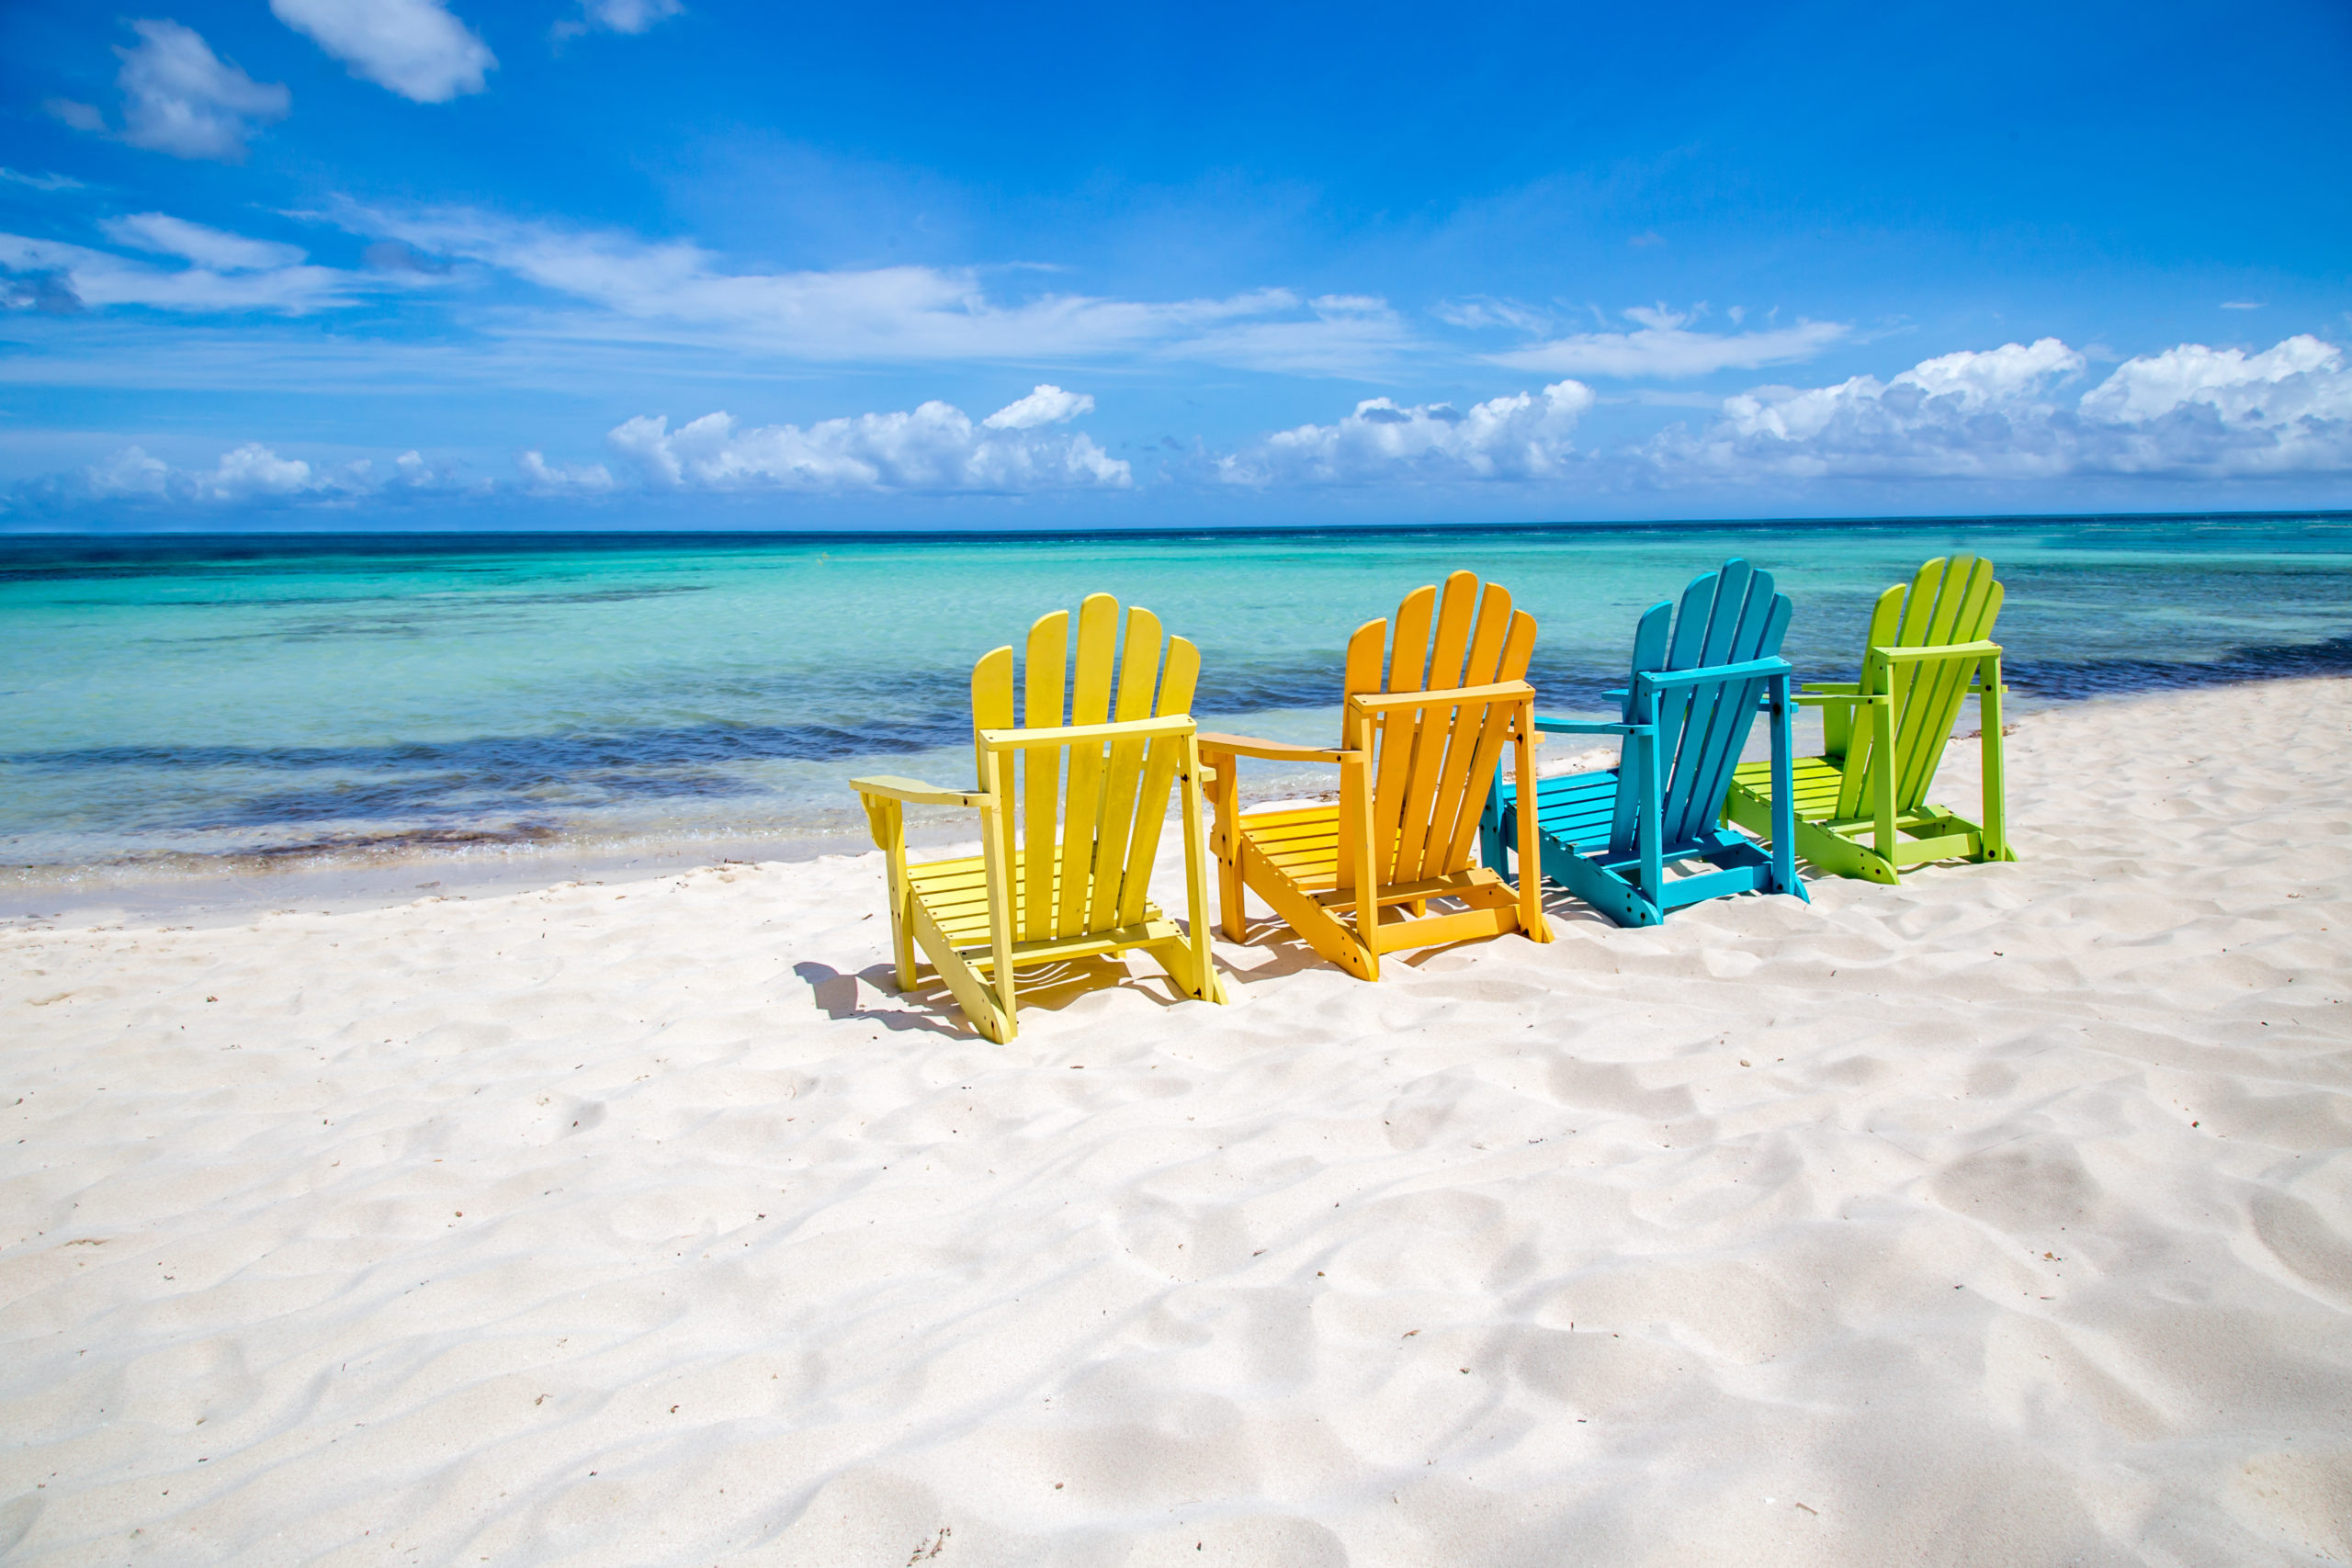 Four colorful beach chairs on a beach